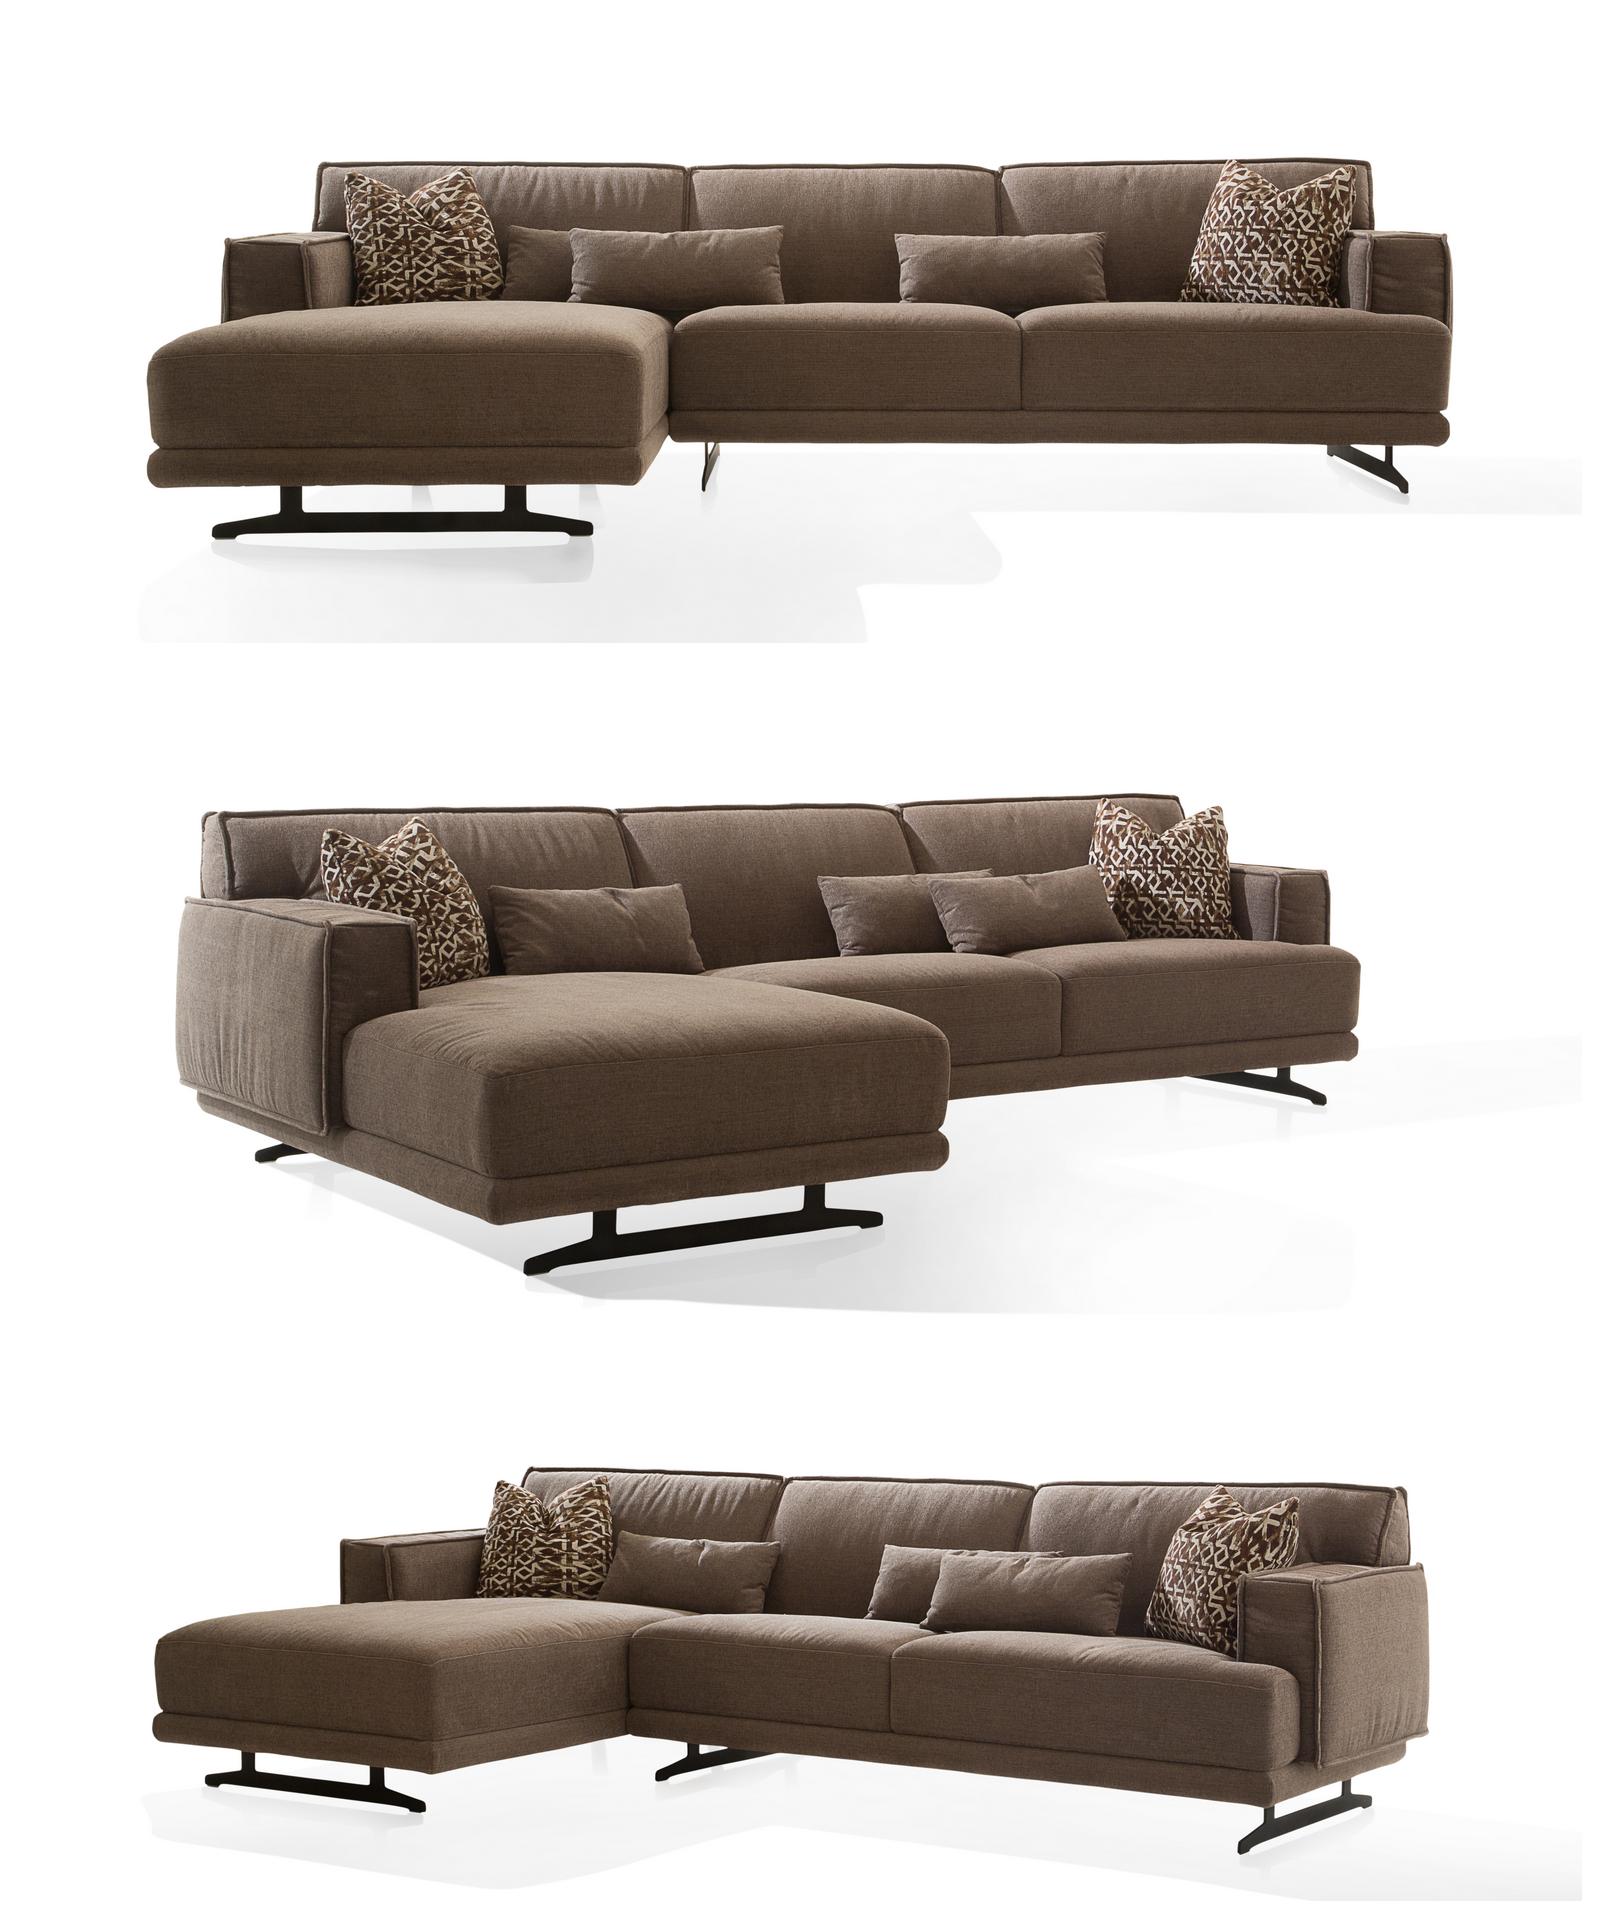 New Design Modern Sofa Set Sofaset Sofa Cocheen Modernsofa Cocheendesign Livingroomsofa Furniture N Modern Sofa Set Contemporary Furnishings Sofa Design